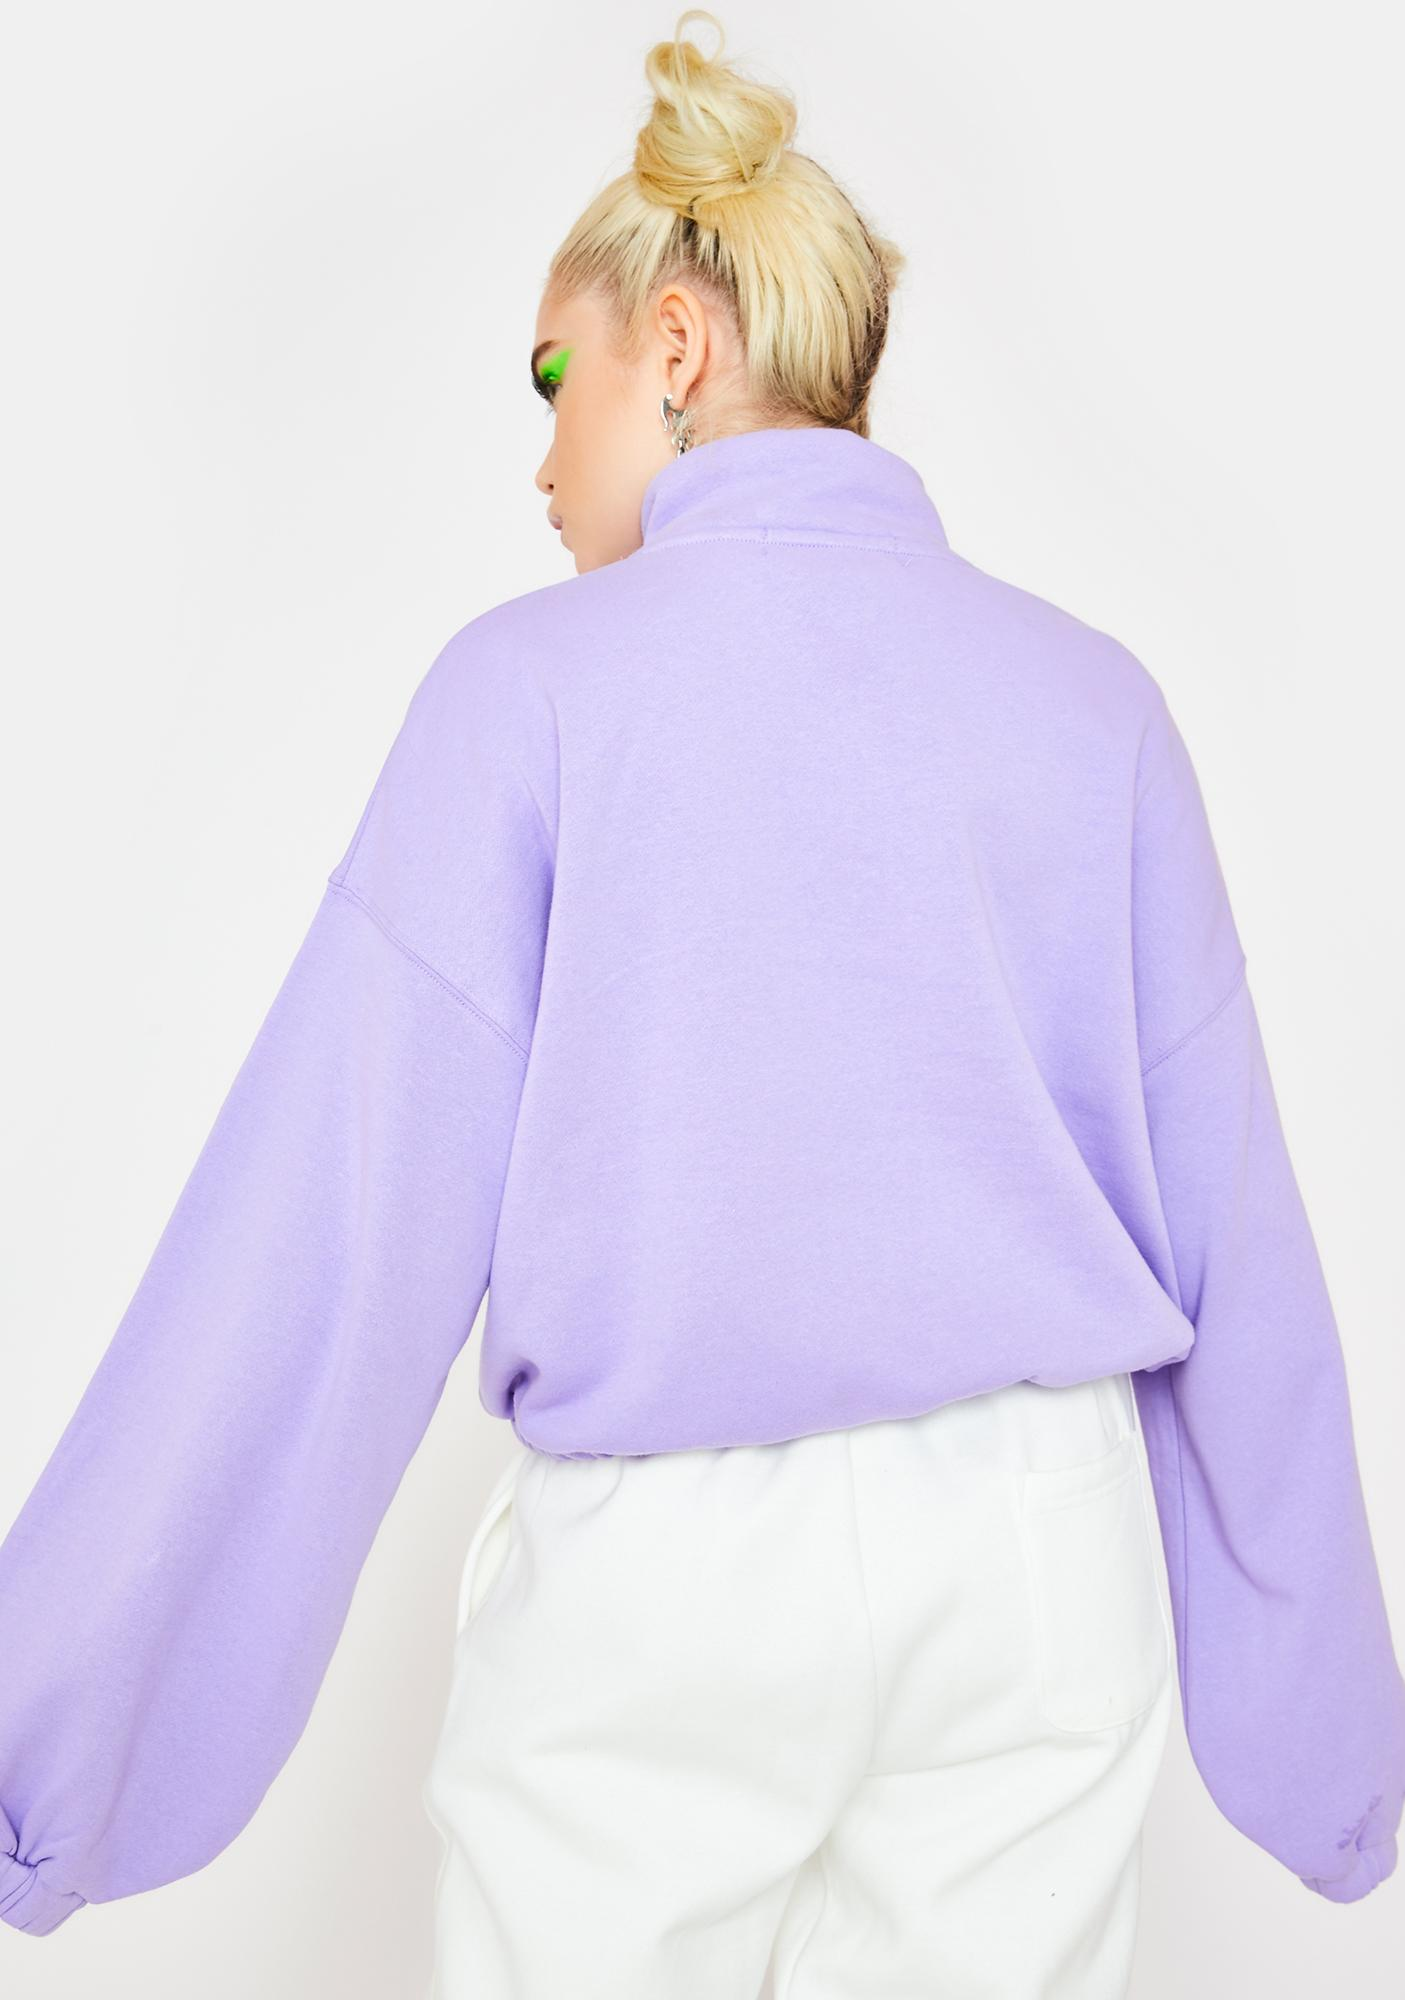 By Samii Ryan Zip It Pullover Top